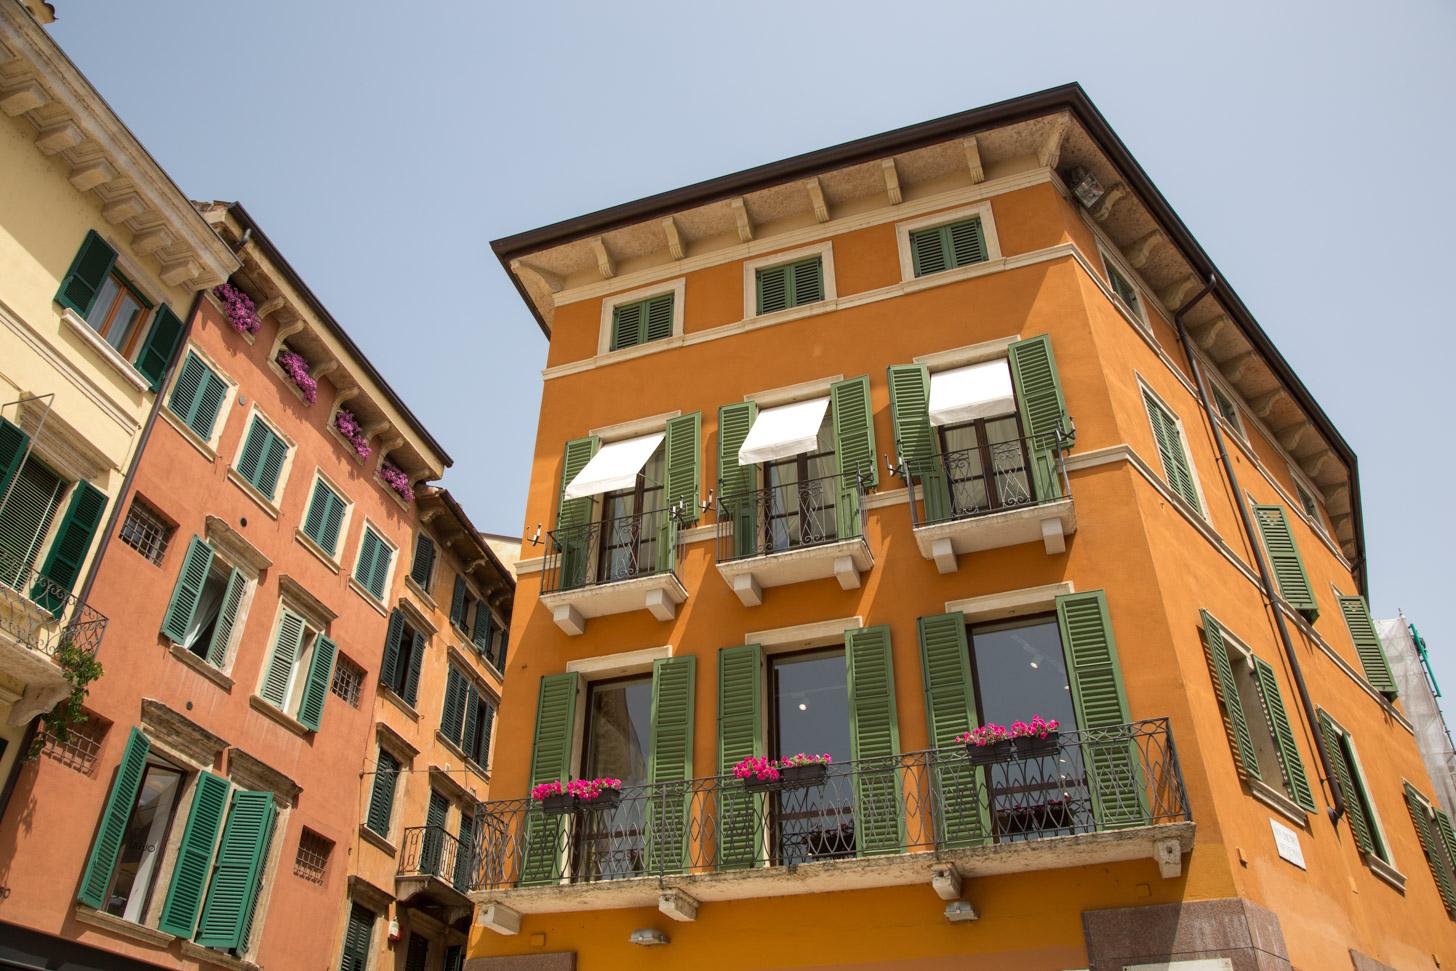 Verona links